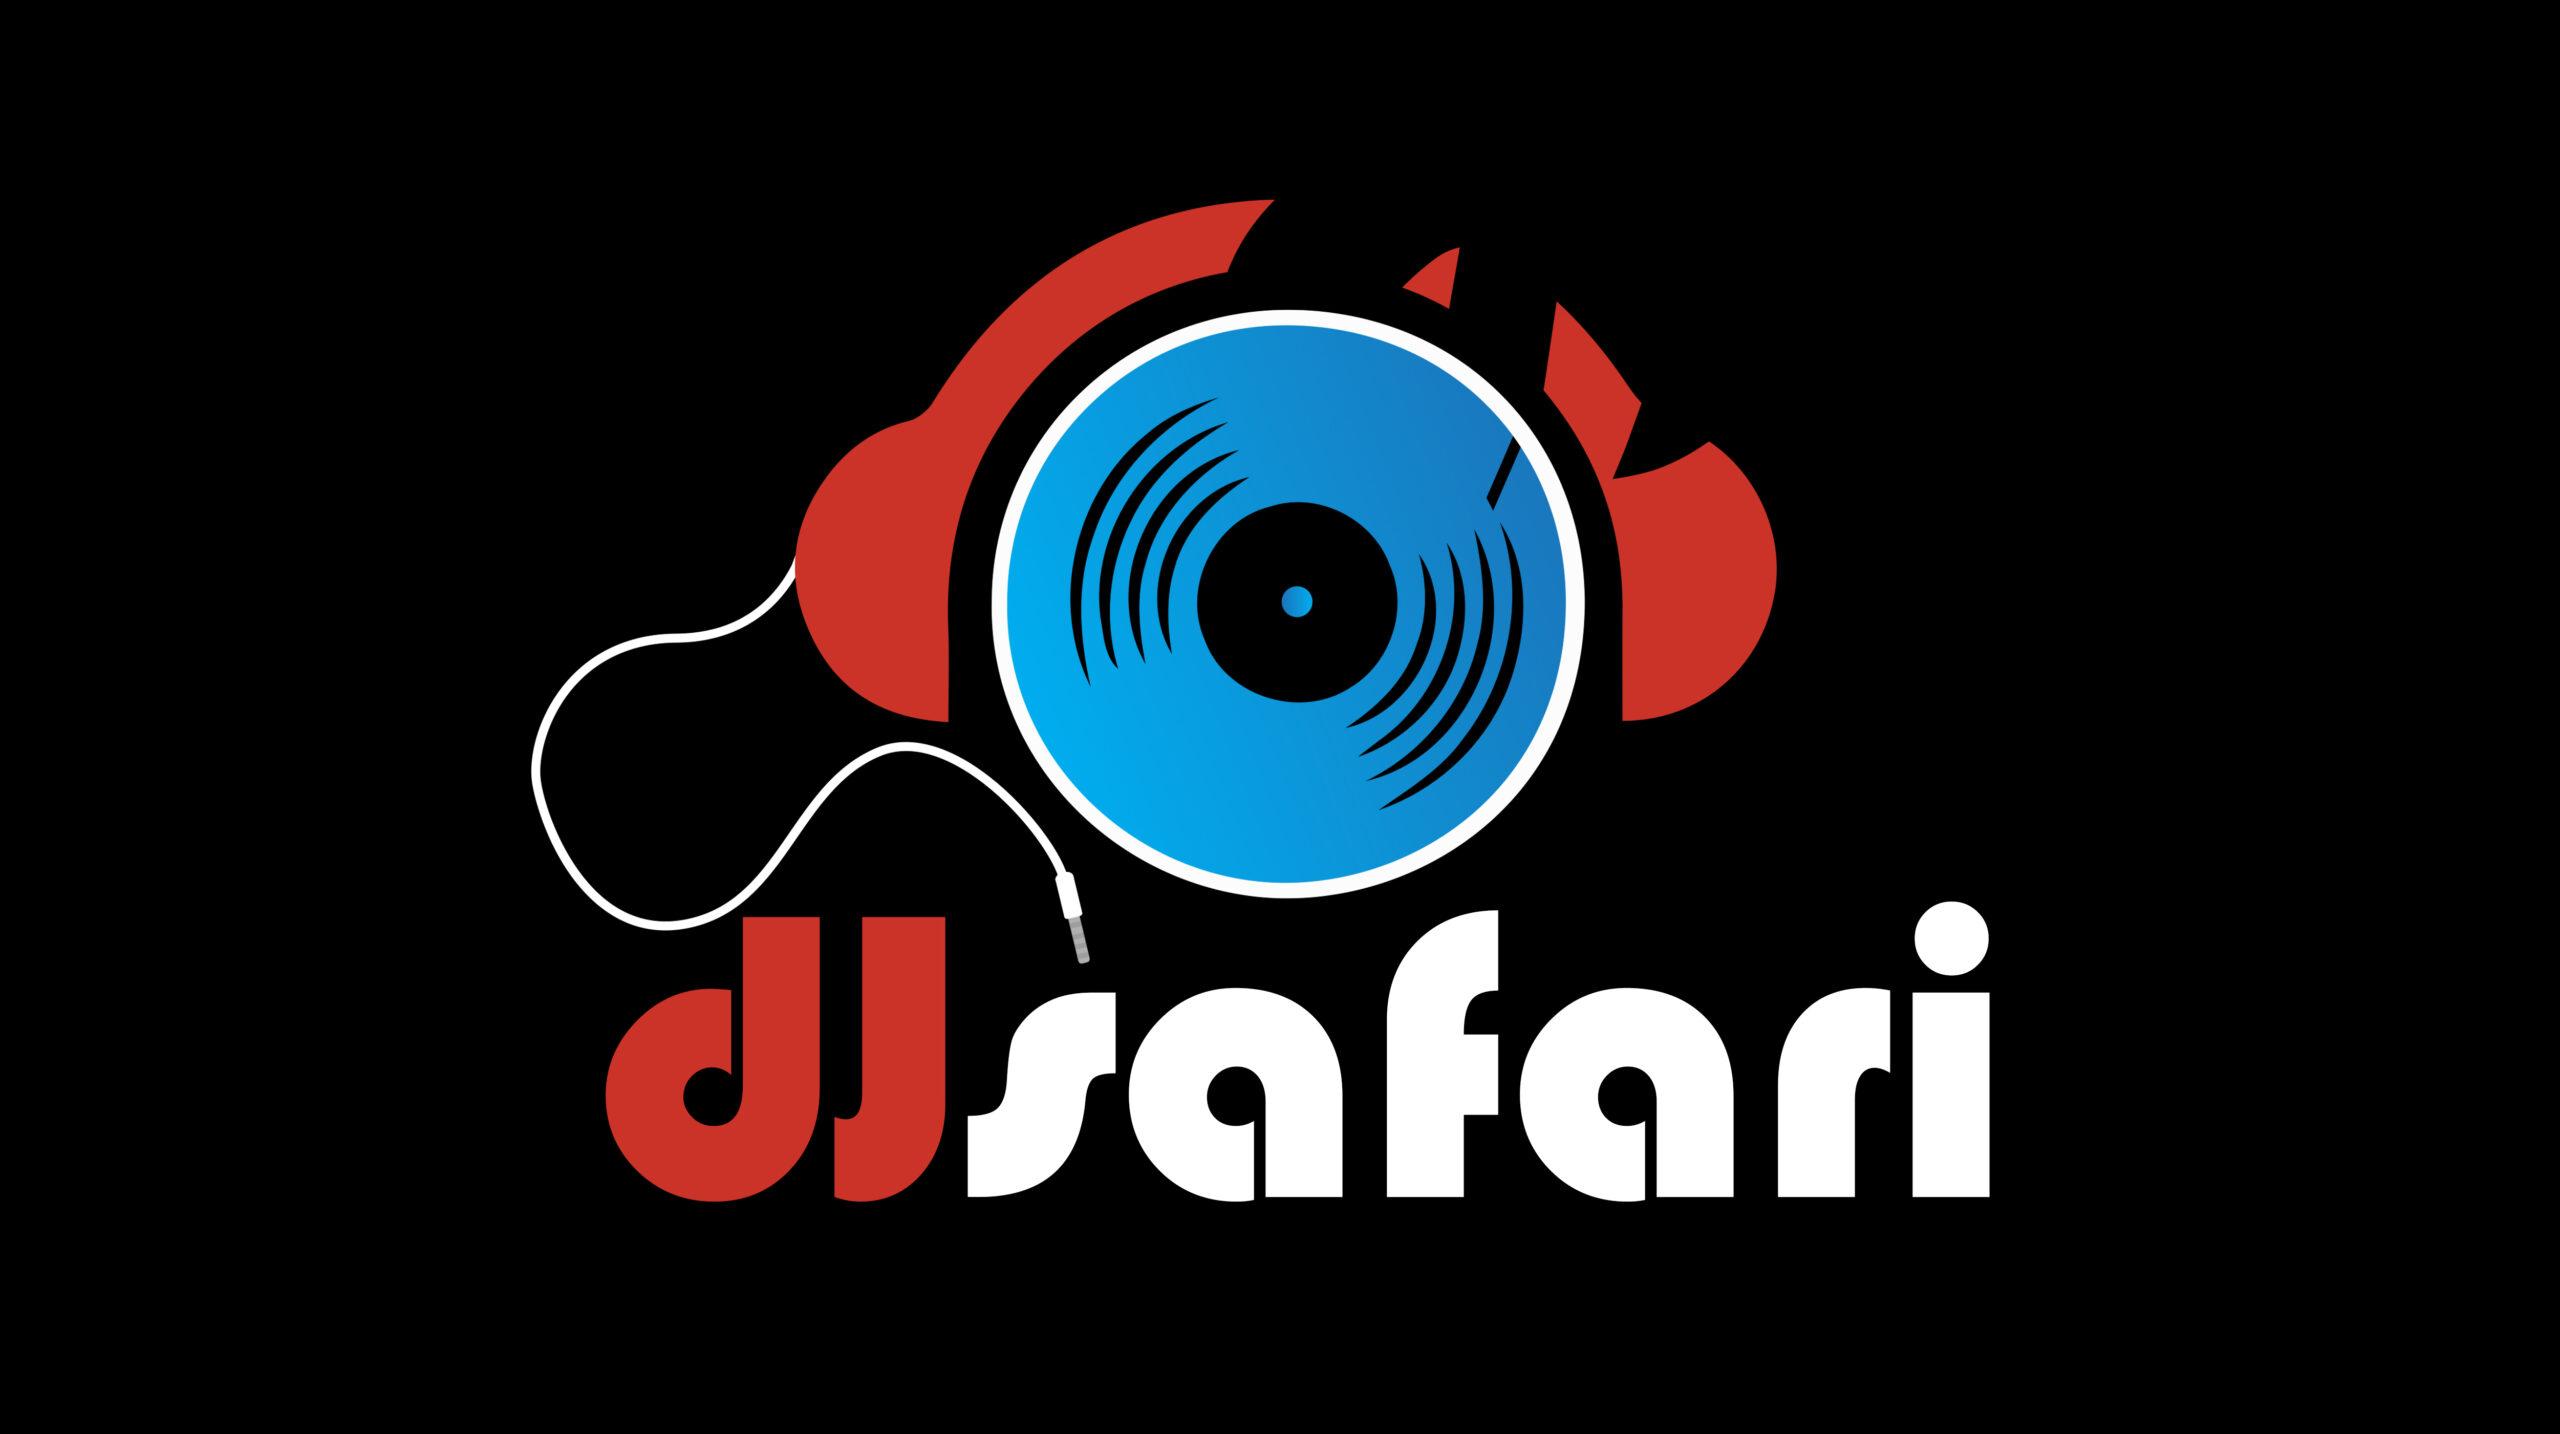 dj-safari-melbourne-logo-design